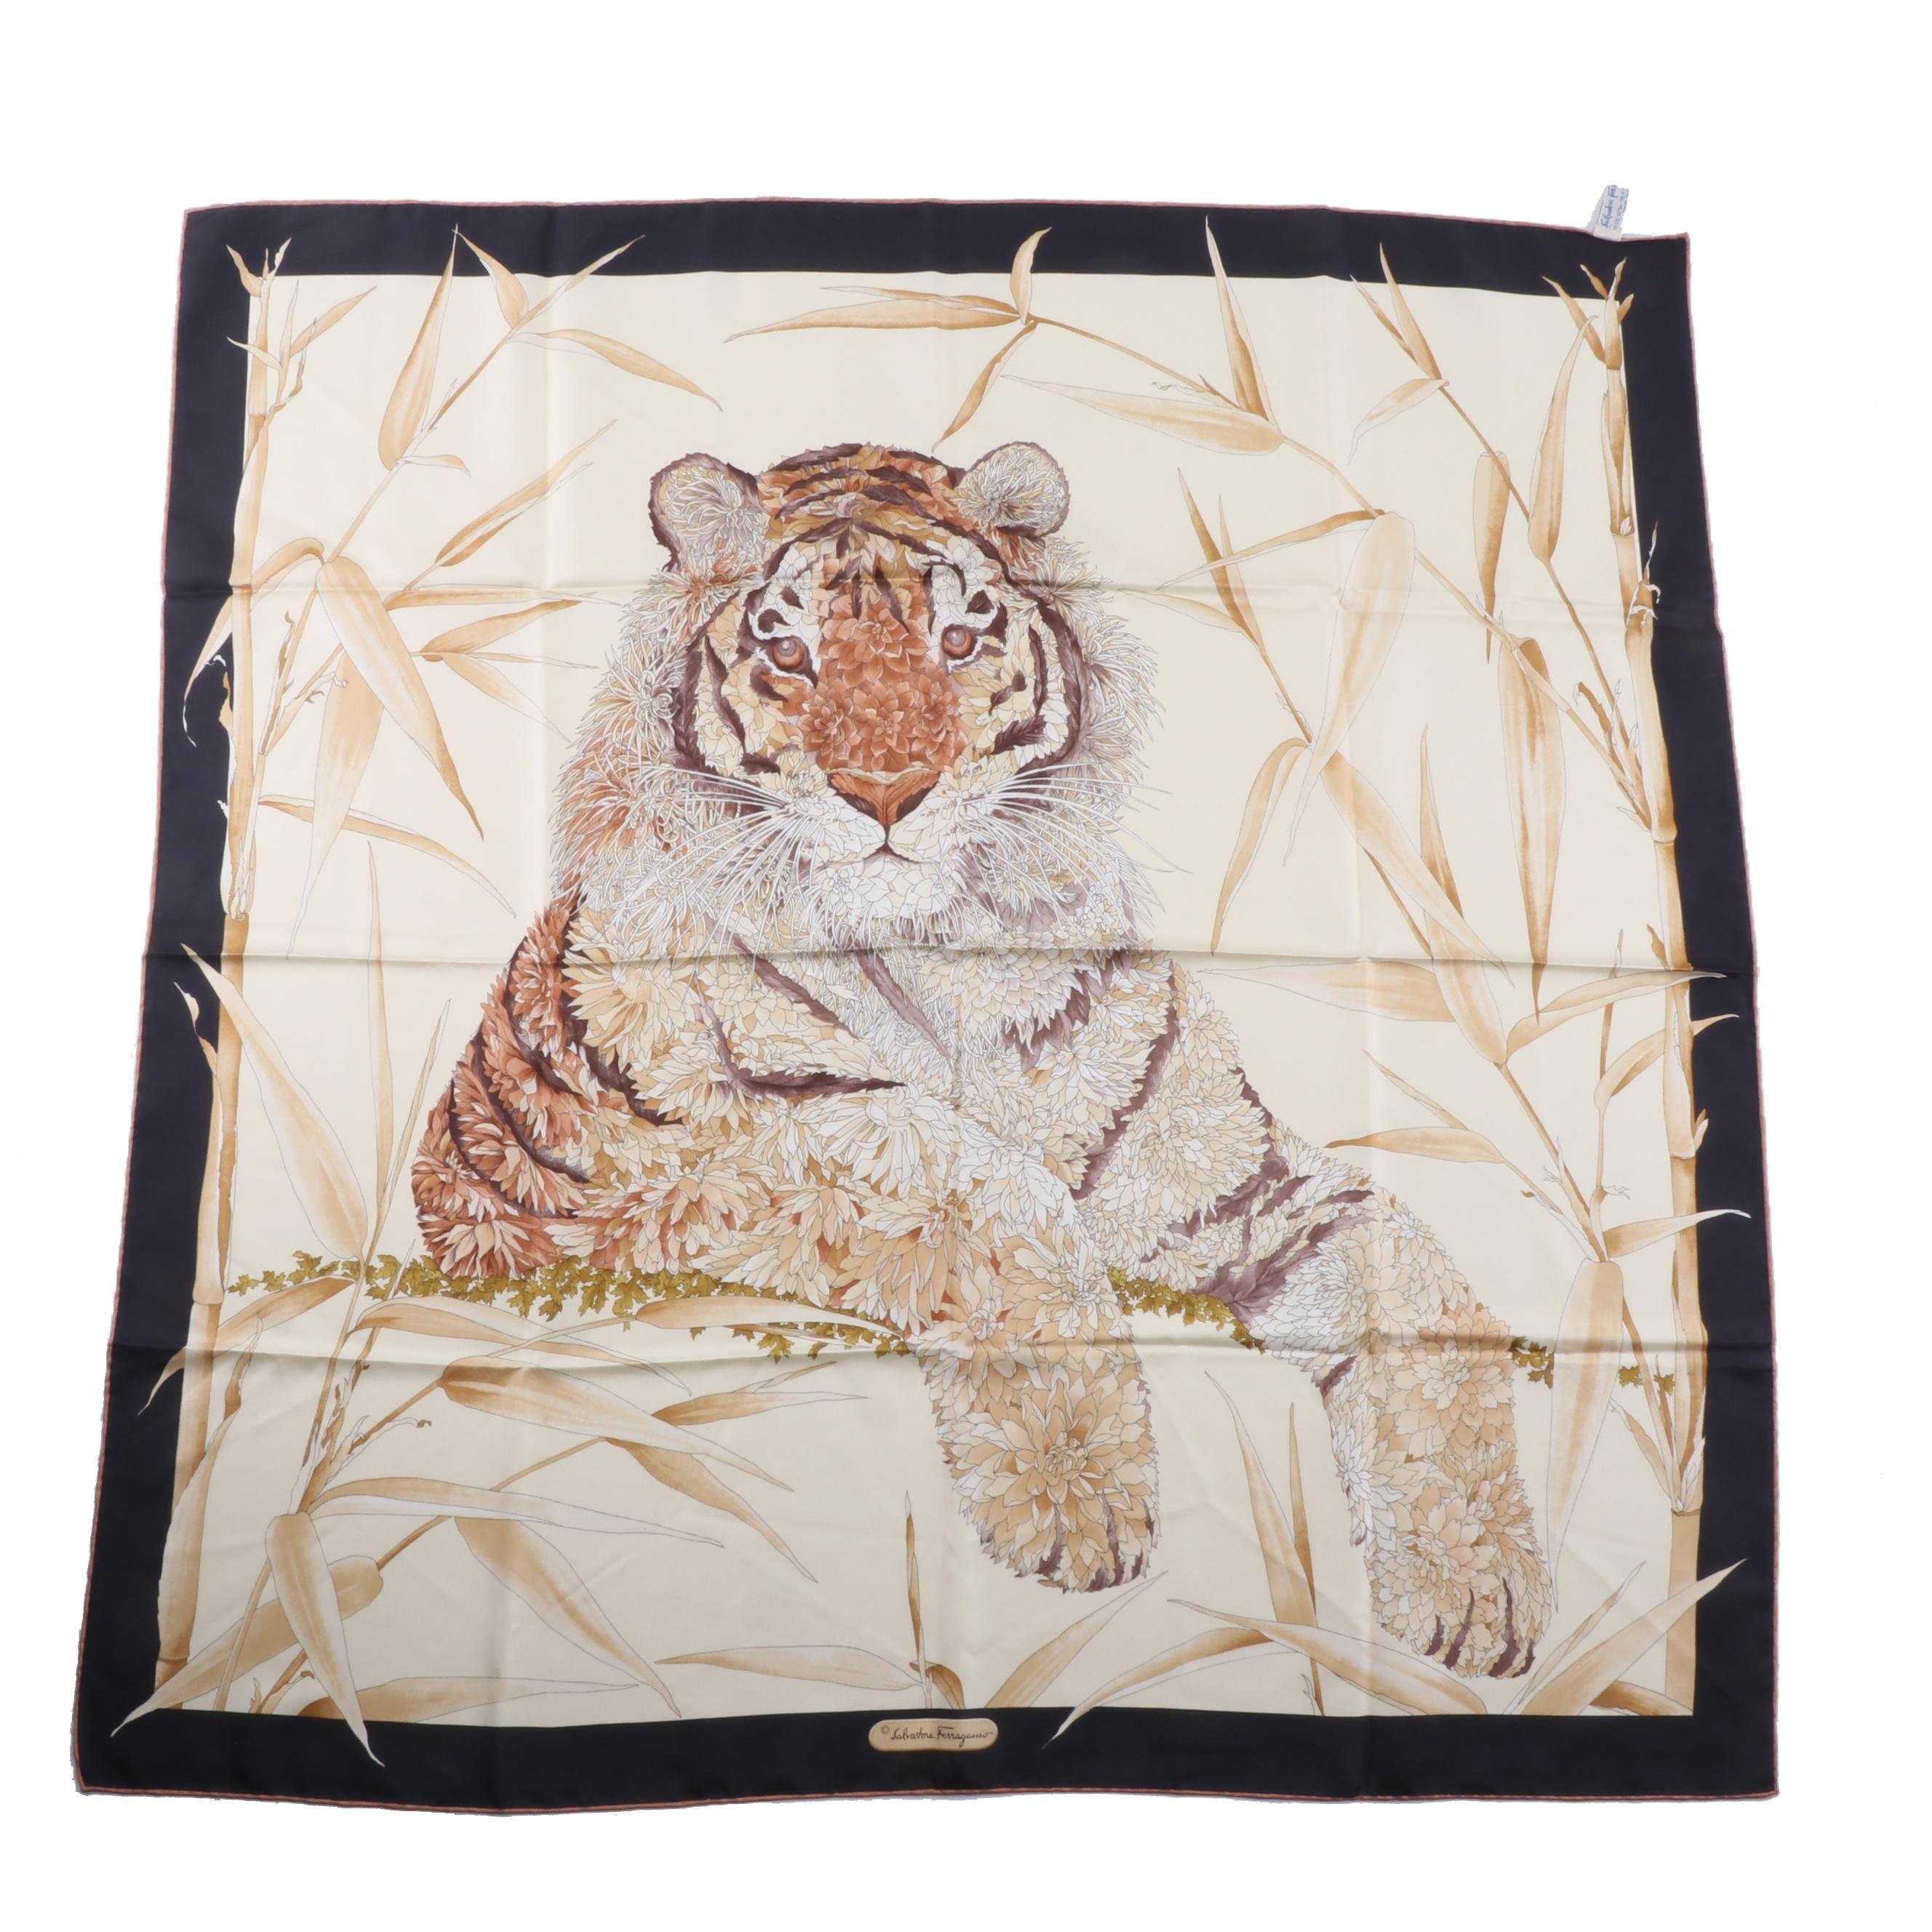 Vintage Salvatore Ferragamo Tiger Print Silk Scarf, Made in Italy